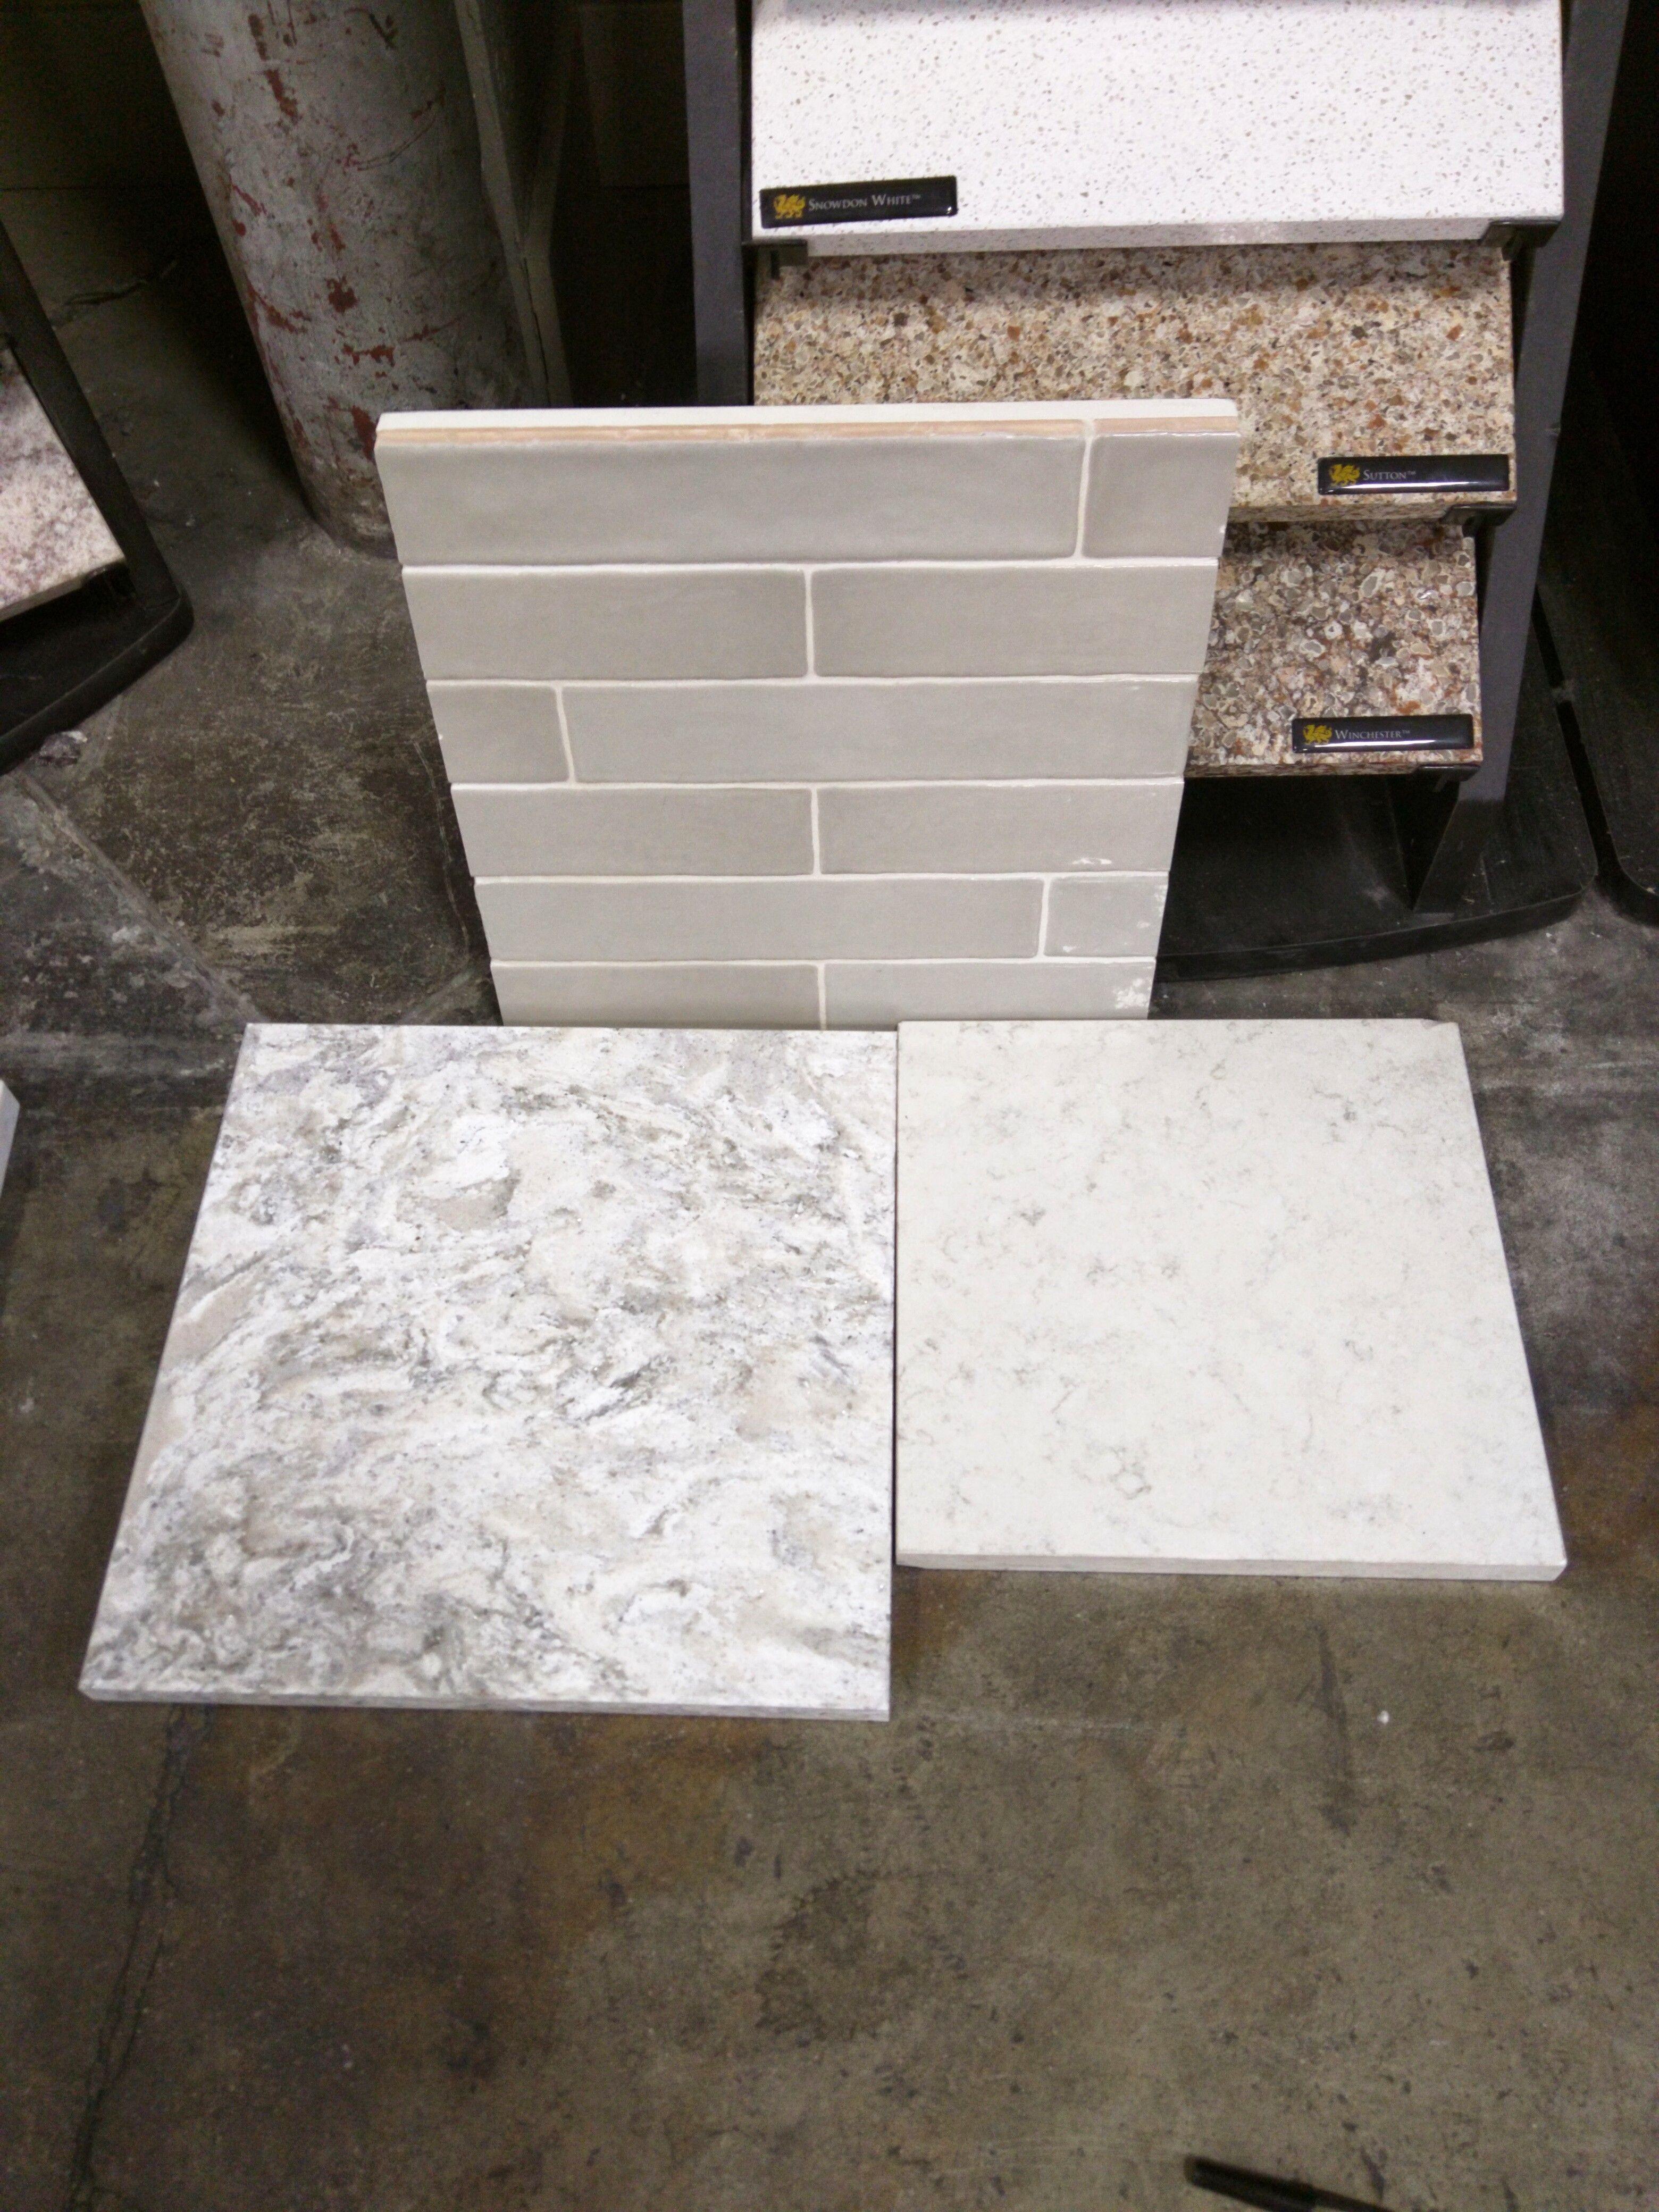 Berwyn Cambria Kitchen: Agora Piastrella Sage Ceramic Backsplash, And Cabria